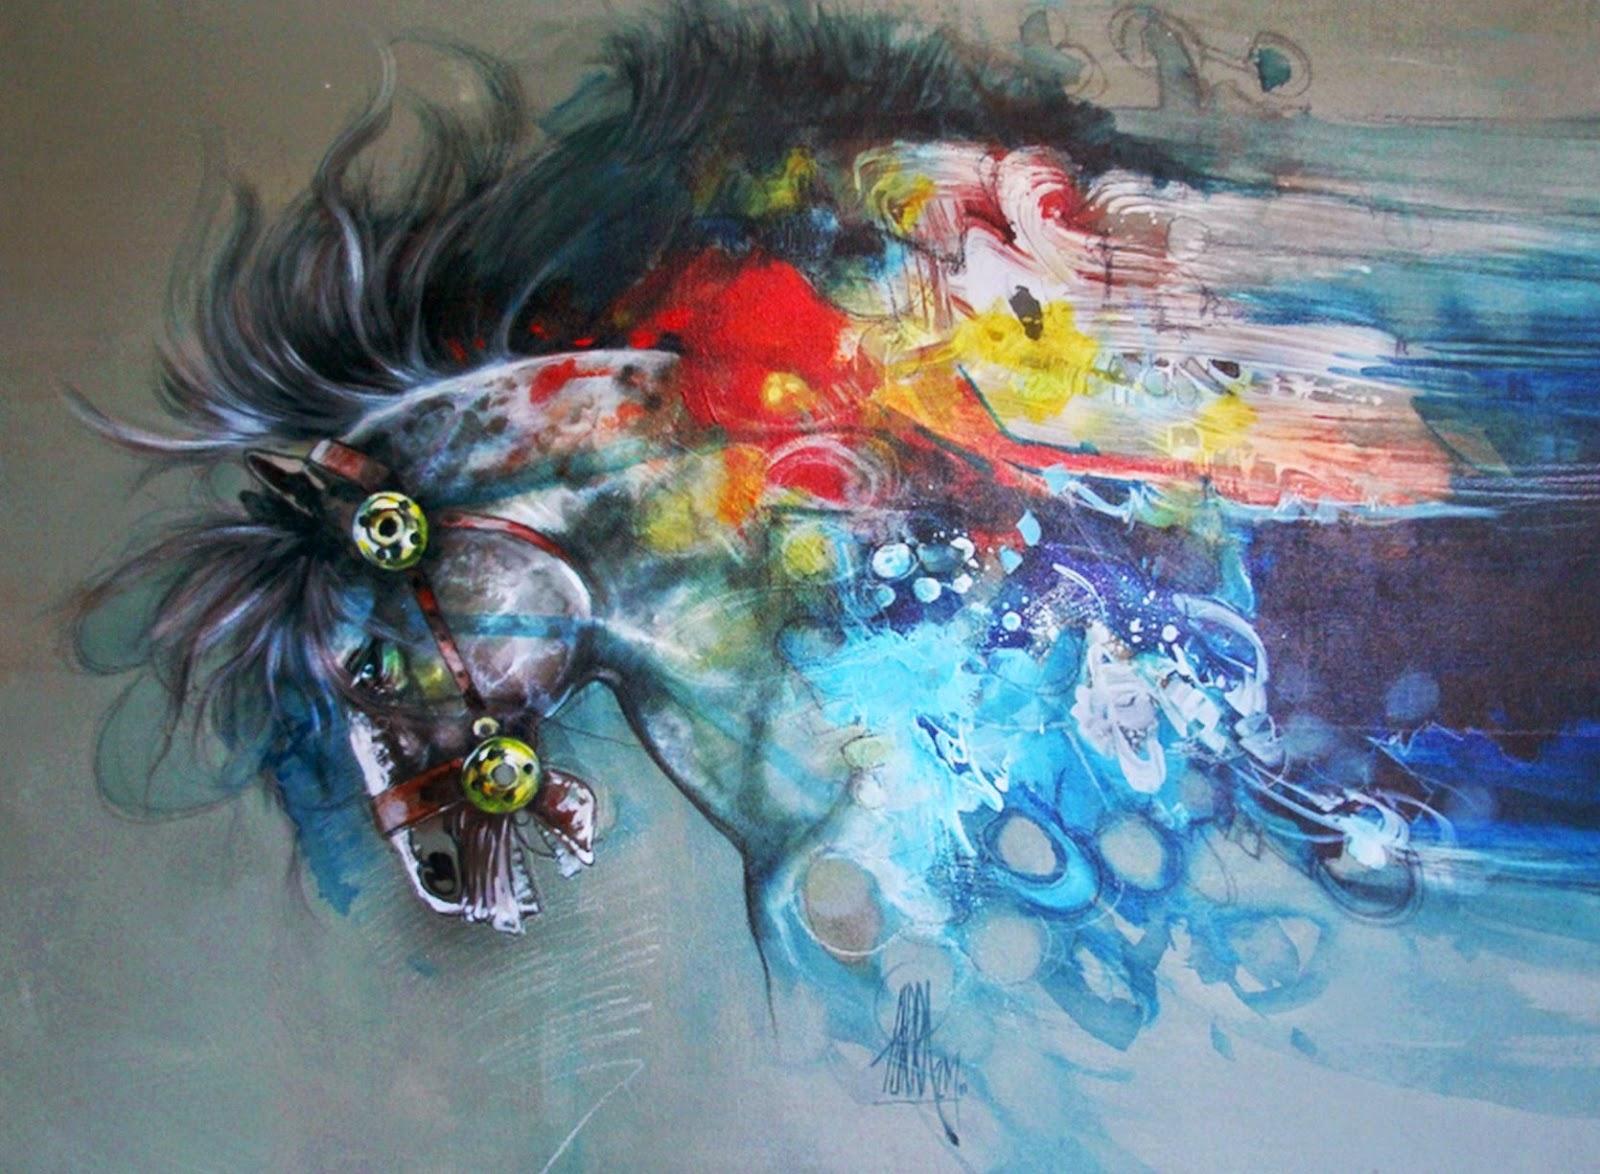 Pintura moderna y fotograf a art stica caballos for Fotos de cuadros abstractos al oleo